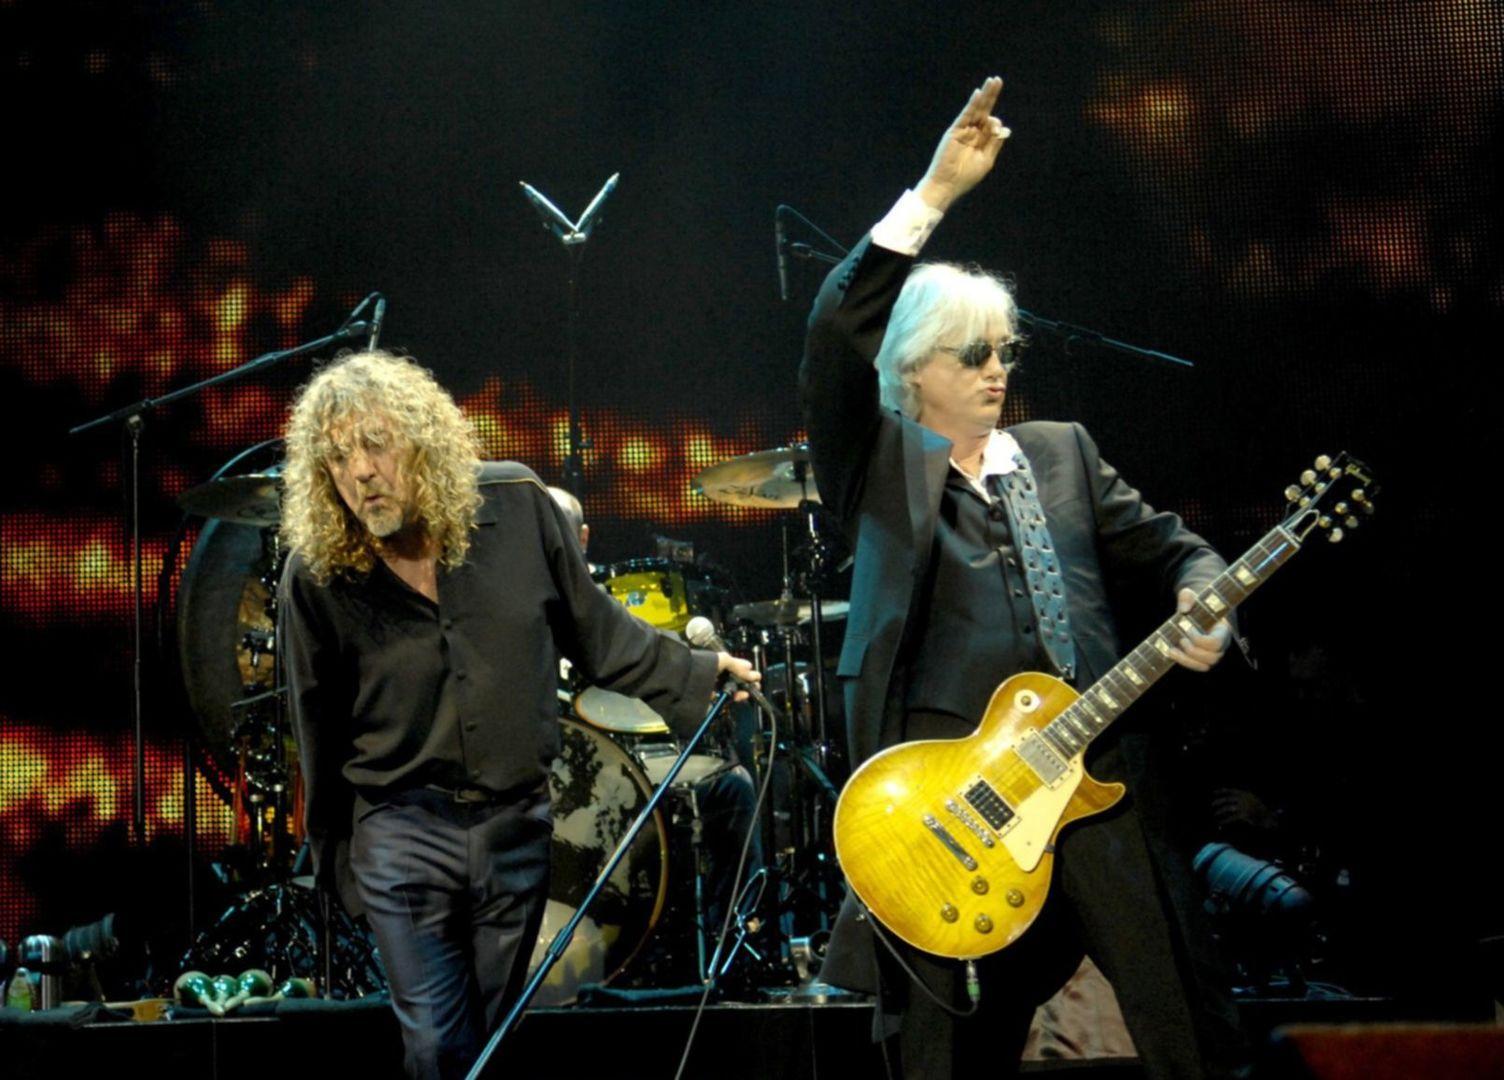 Led_Zeppelin_live_promo